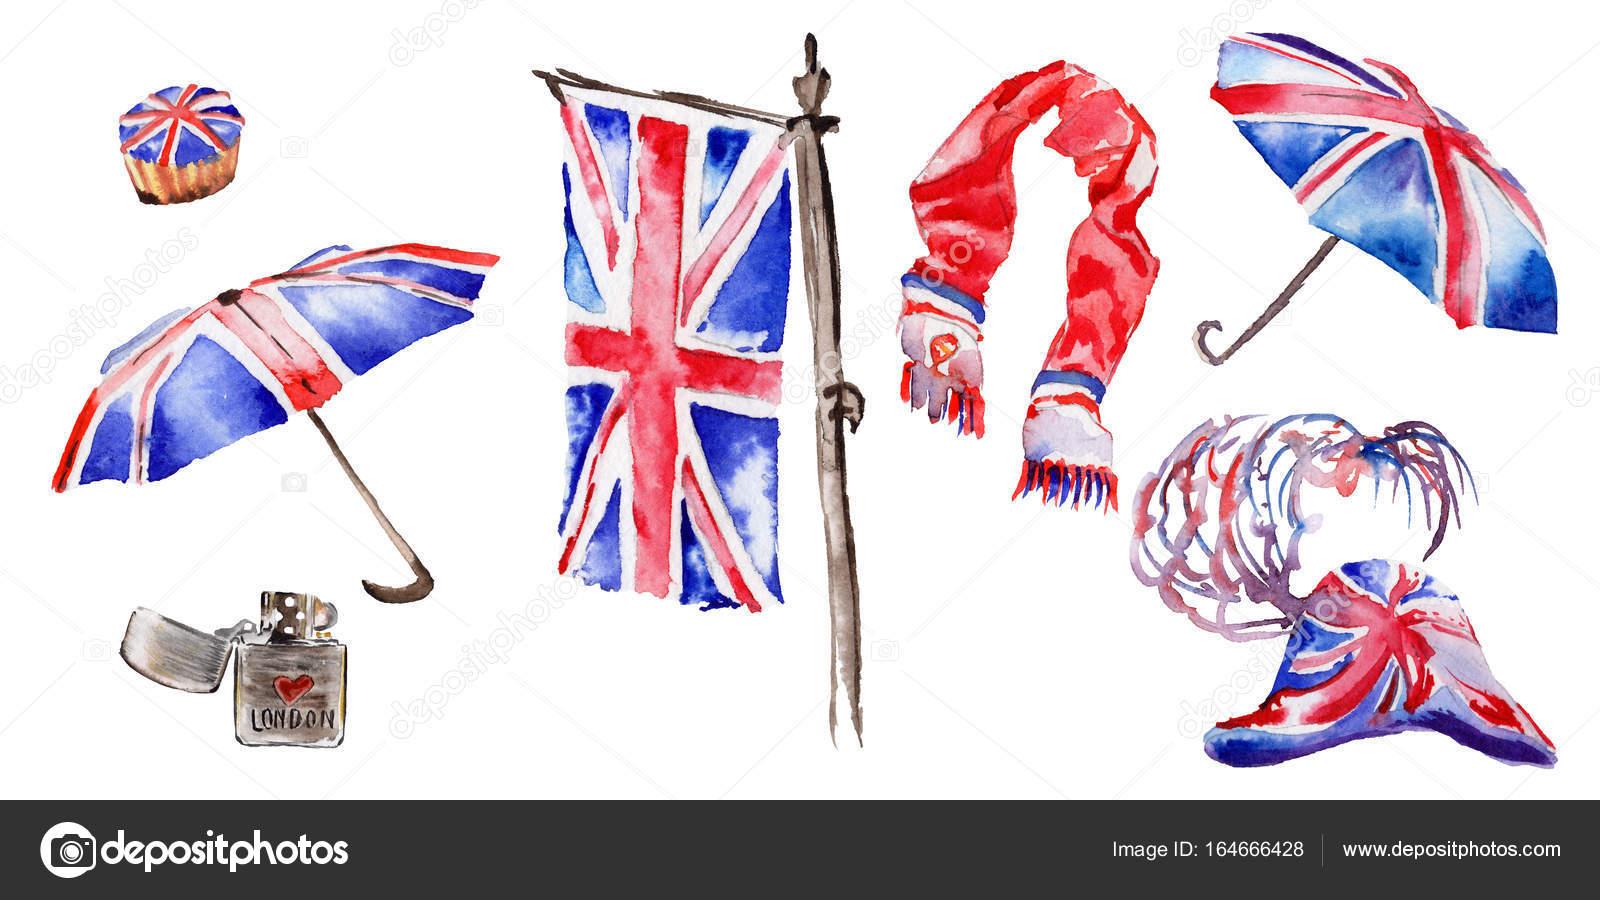 Watercolor London Illustration Great Britain Hand Drawn Symbols Red Phone Booth Big Ben Clock Flag Of Tower Bridge